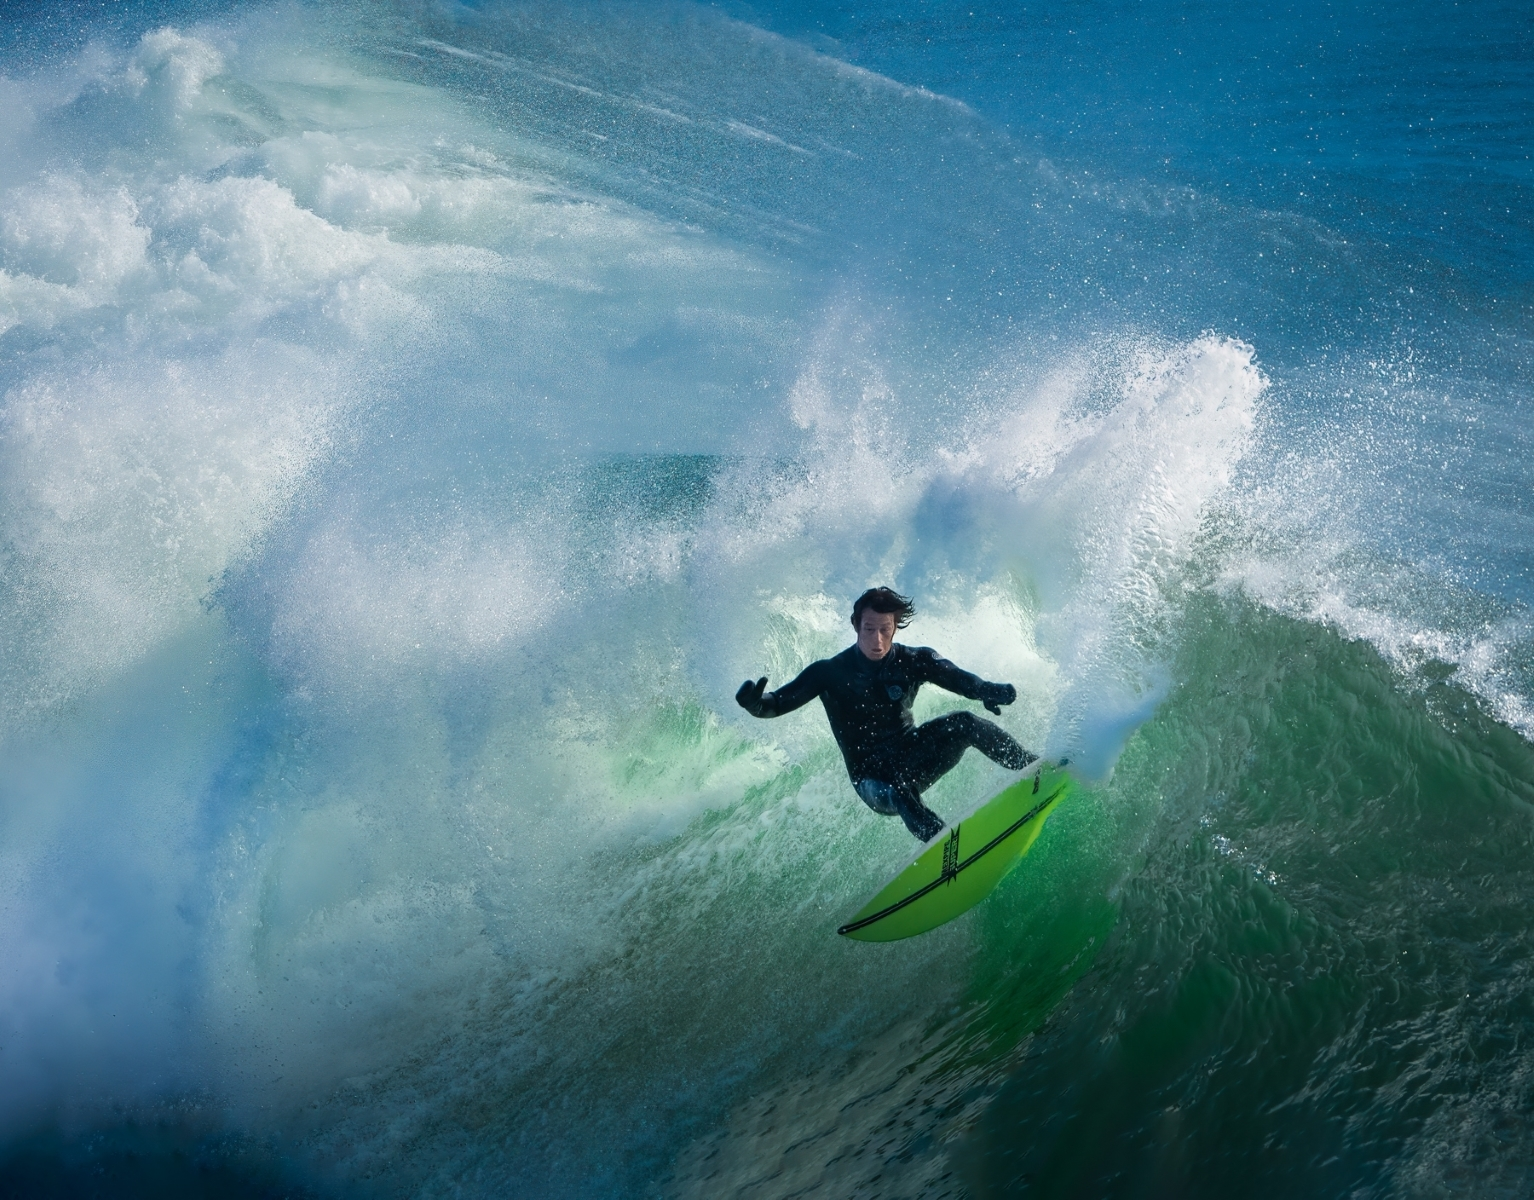 Wave-rider-PA-1-Place-by-Jason-Cheng-FR